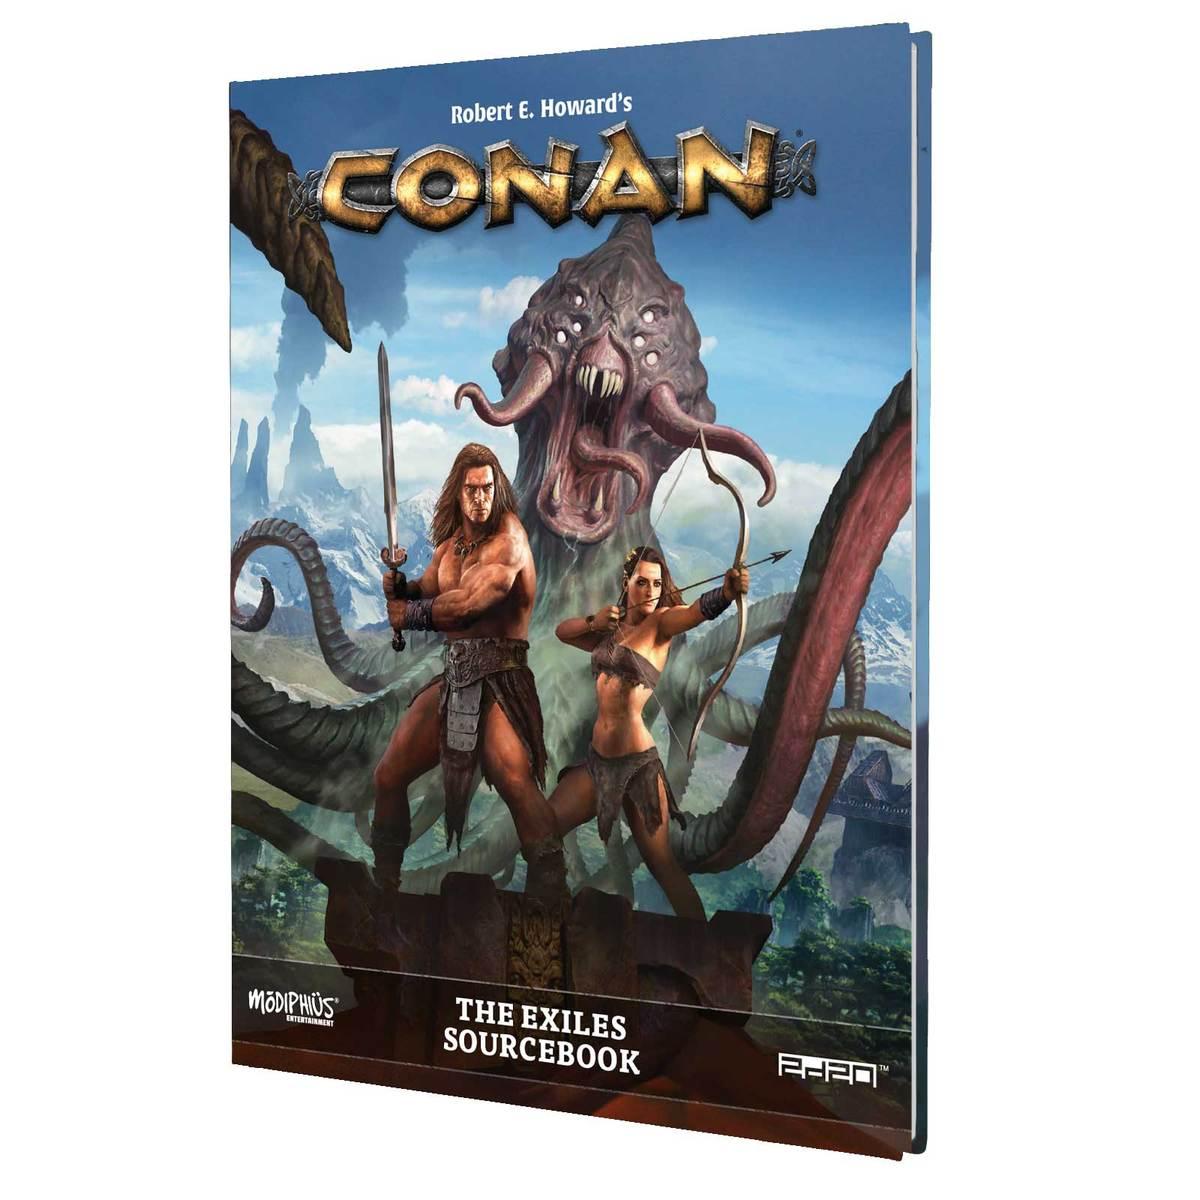 conan-the-exiles-sourcebook-228153_1200x.jpg